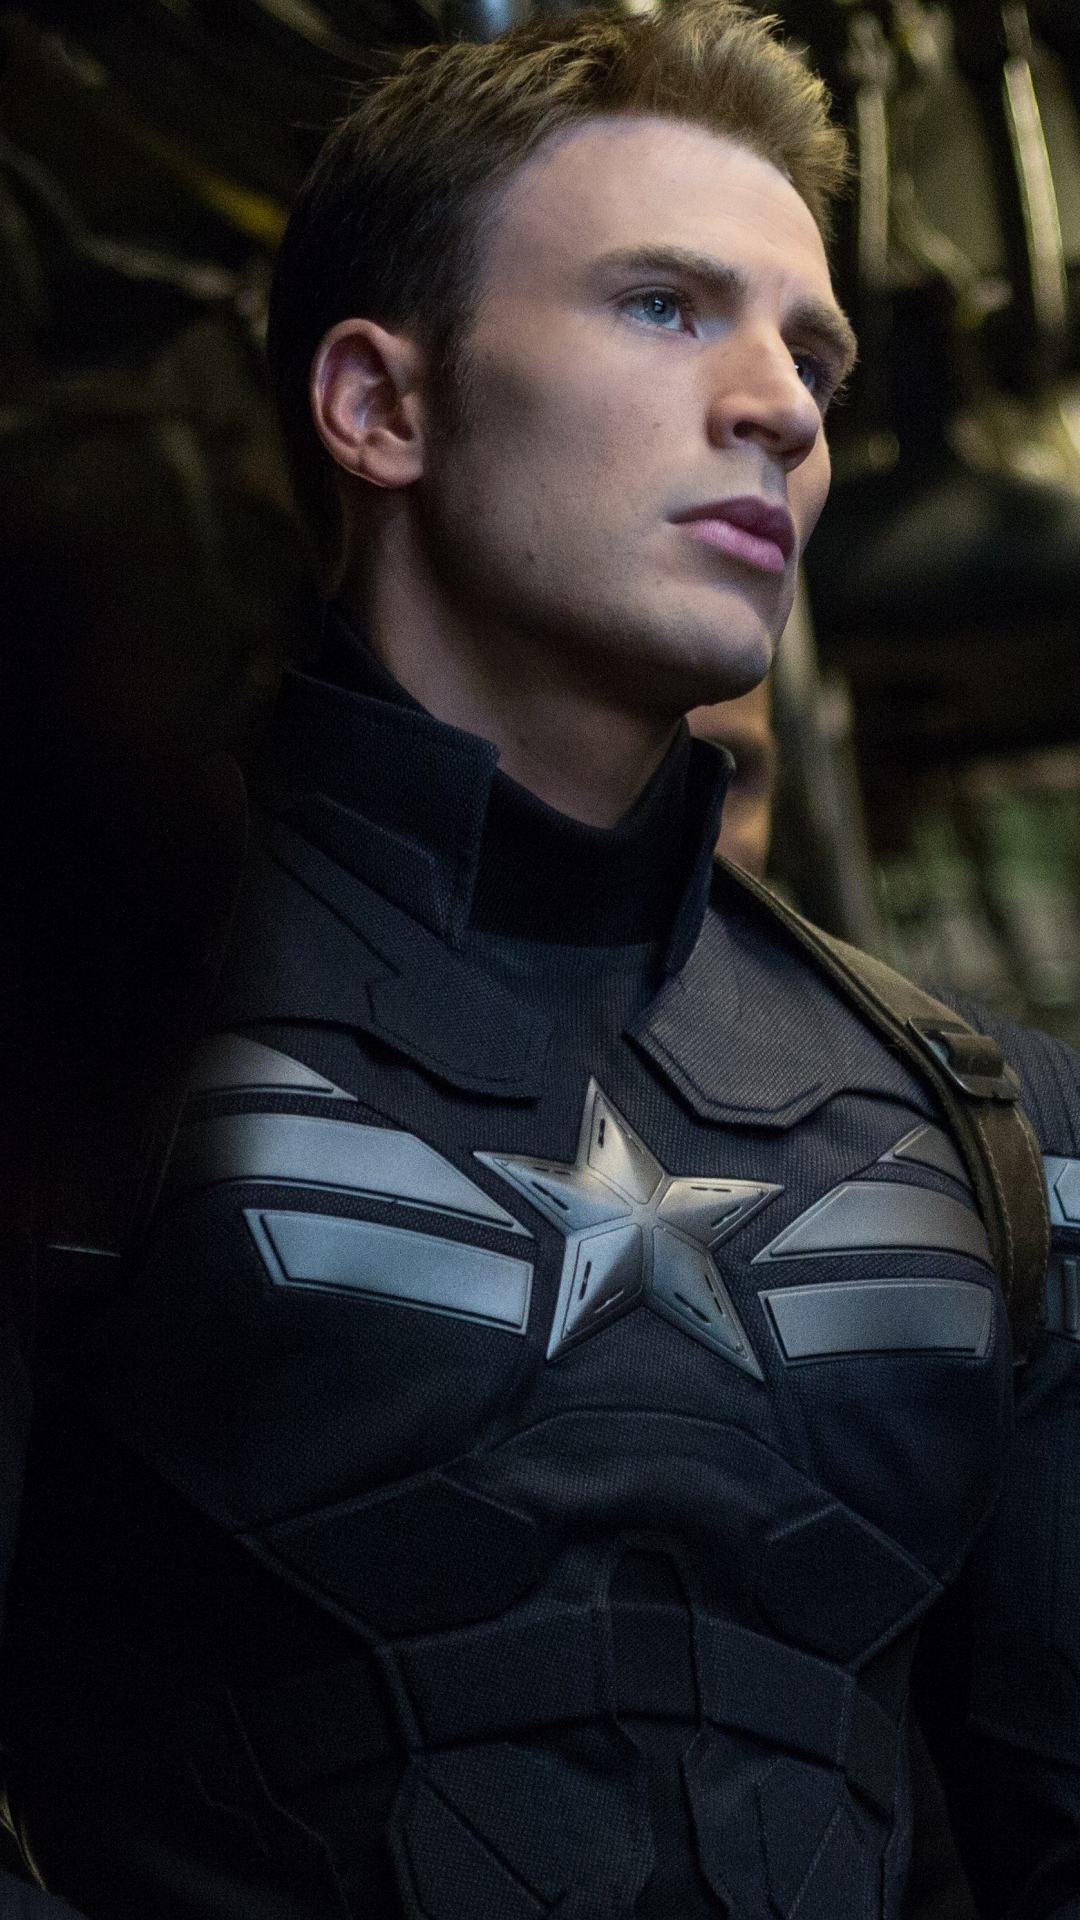 Cute Cap Bucky Iphone Wallpaper Captain America Iphone Wallpapers Pixelstalk Net